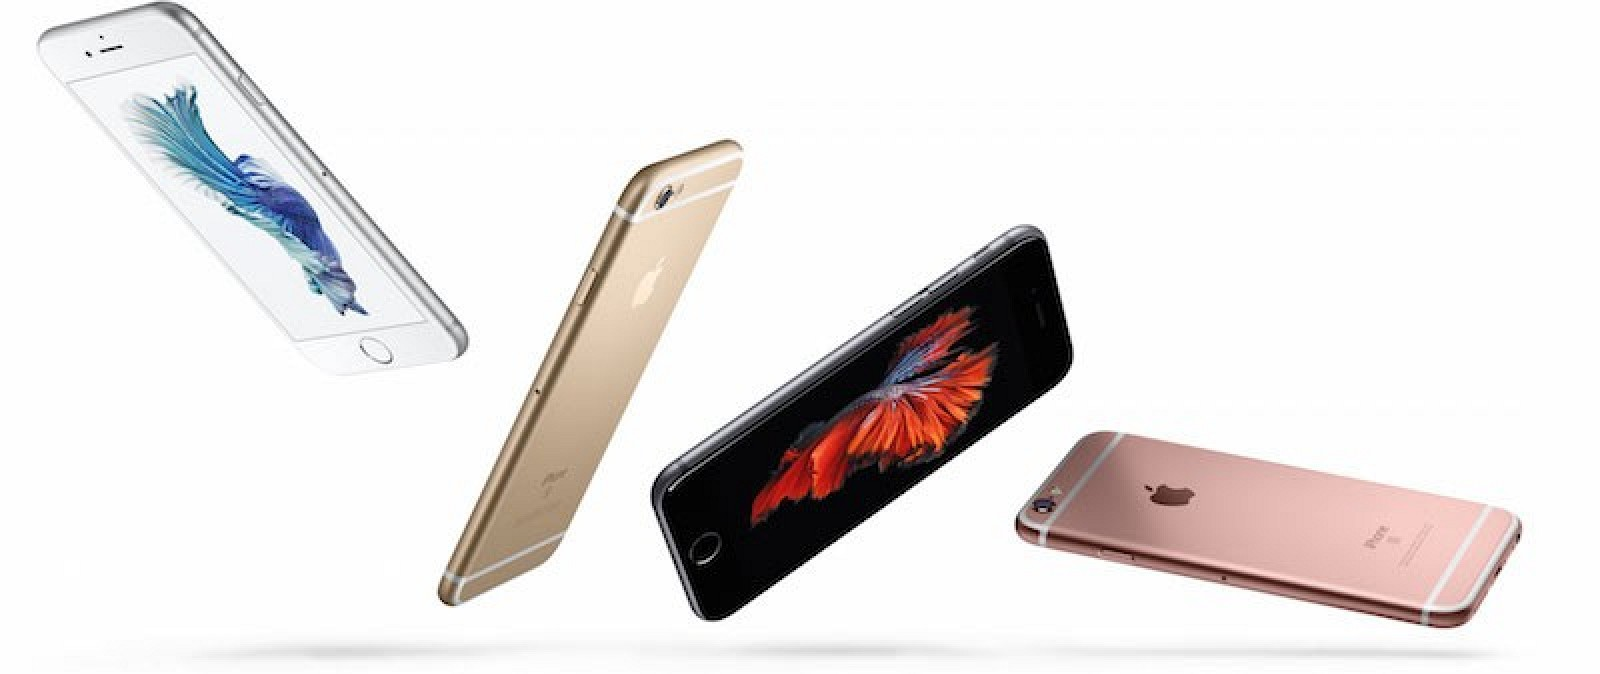 iPhone-6s-main-800x337.jpg